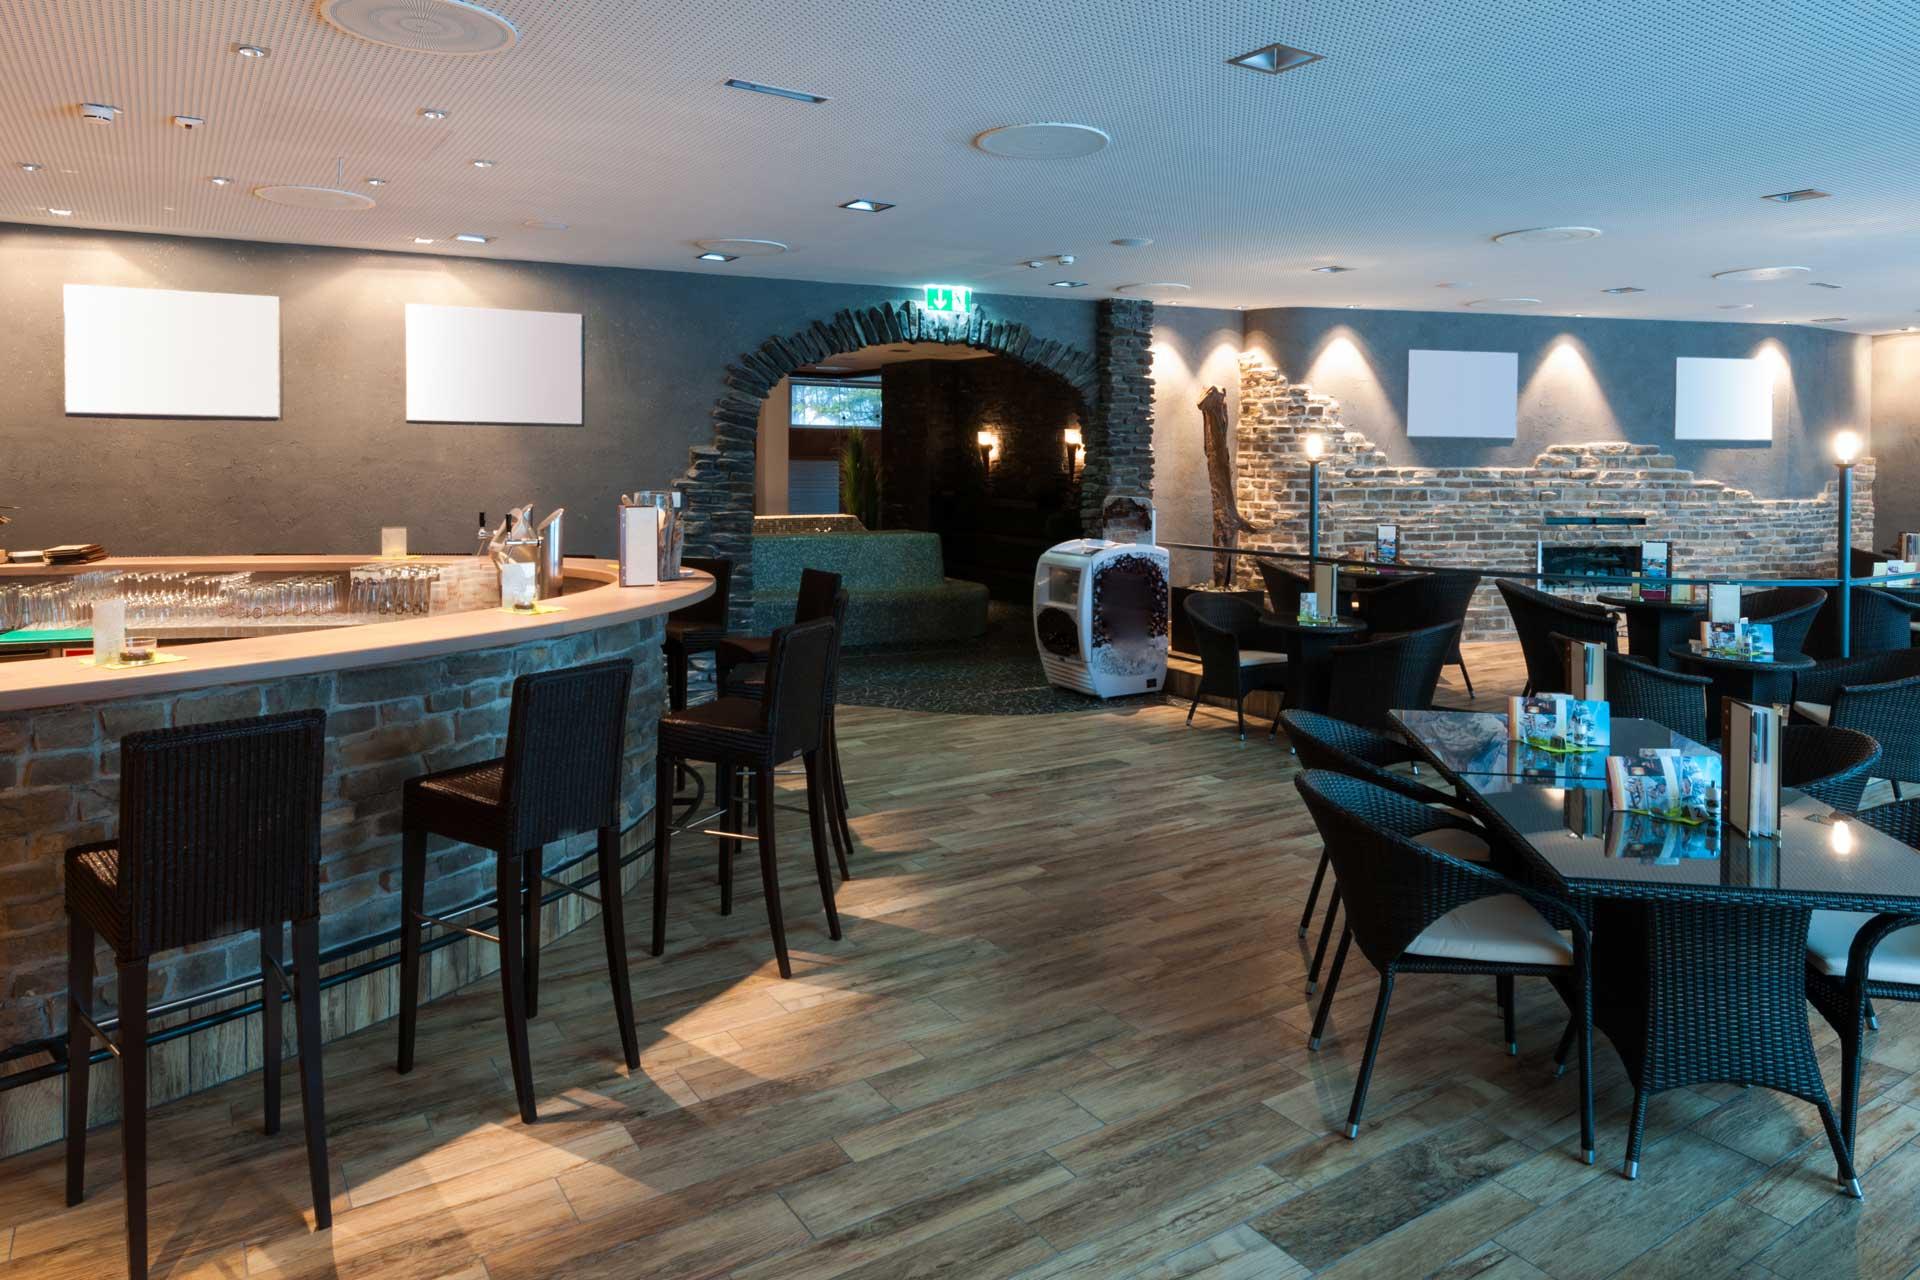 Stone bar room